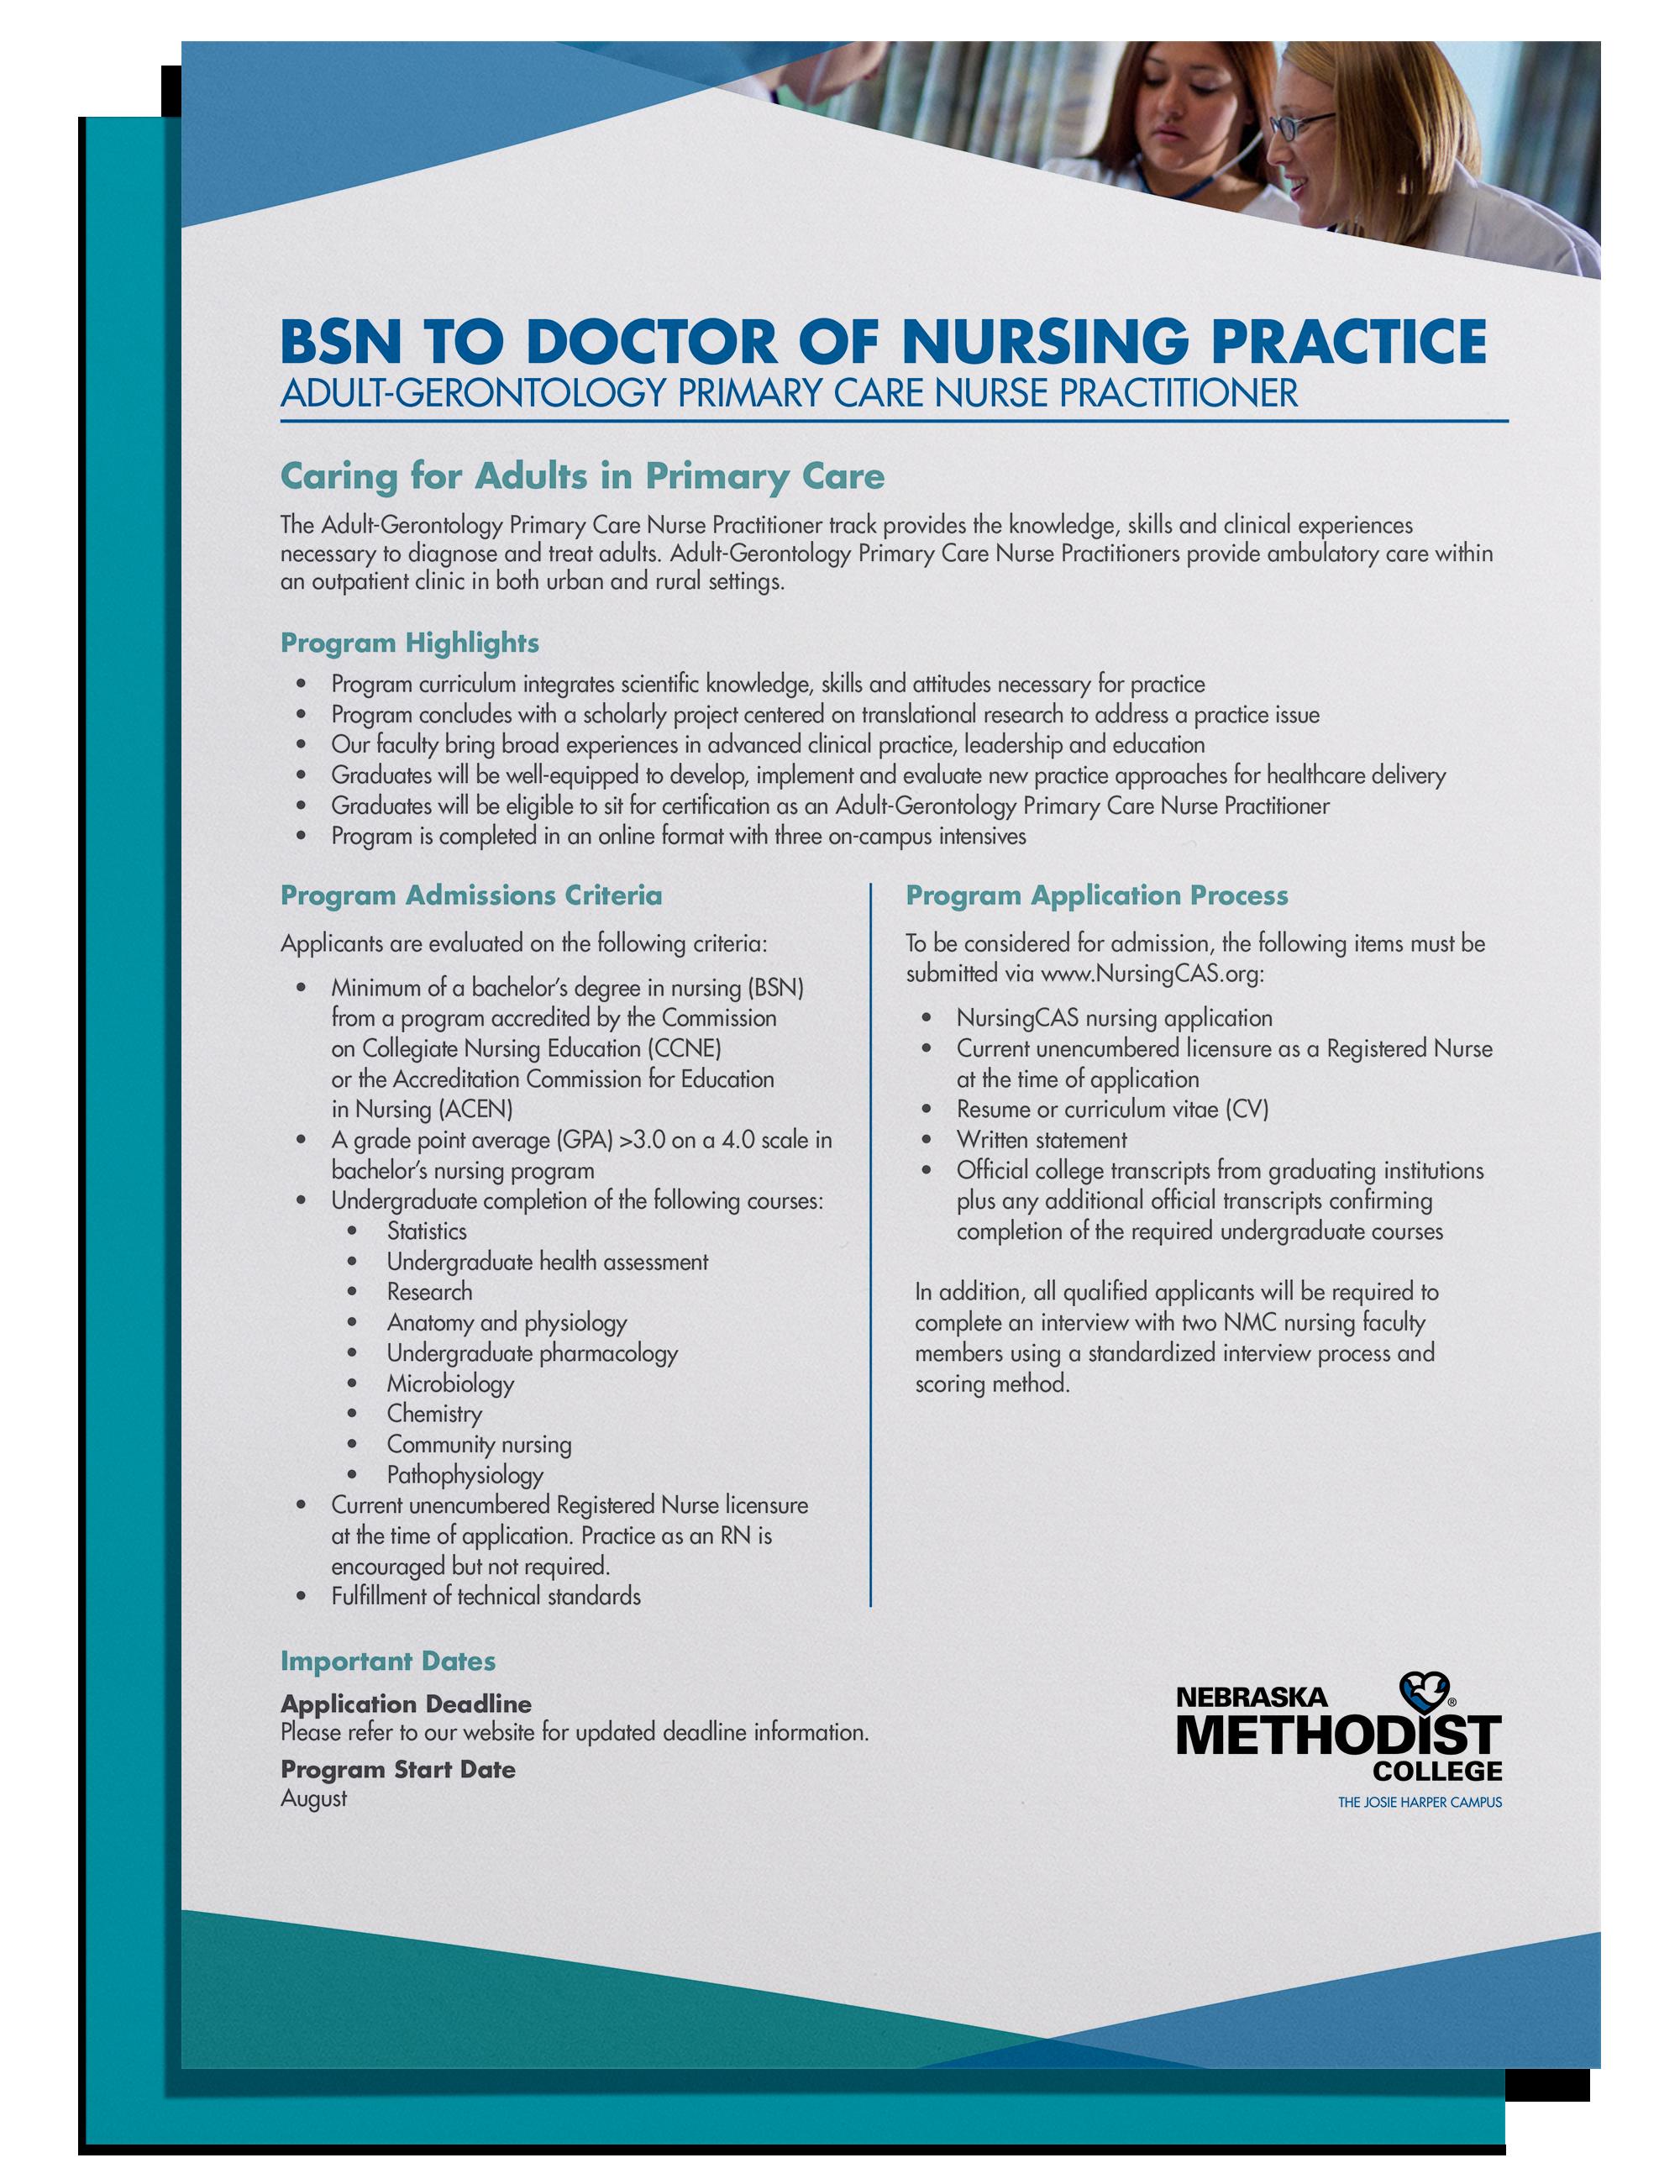 Adult Gerontology Primary Care Nurse Practitioner